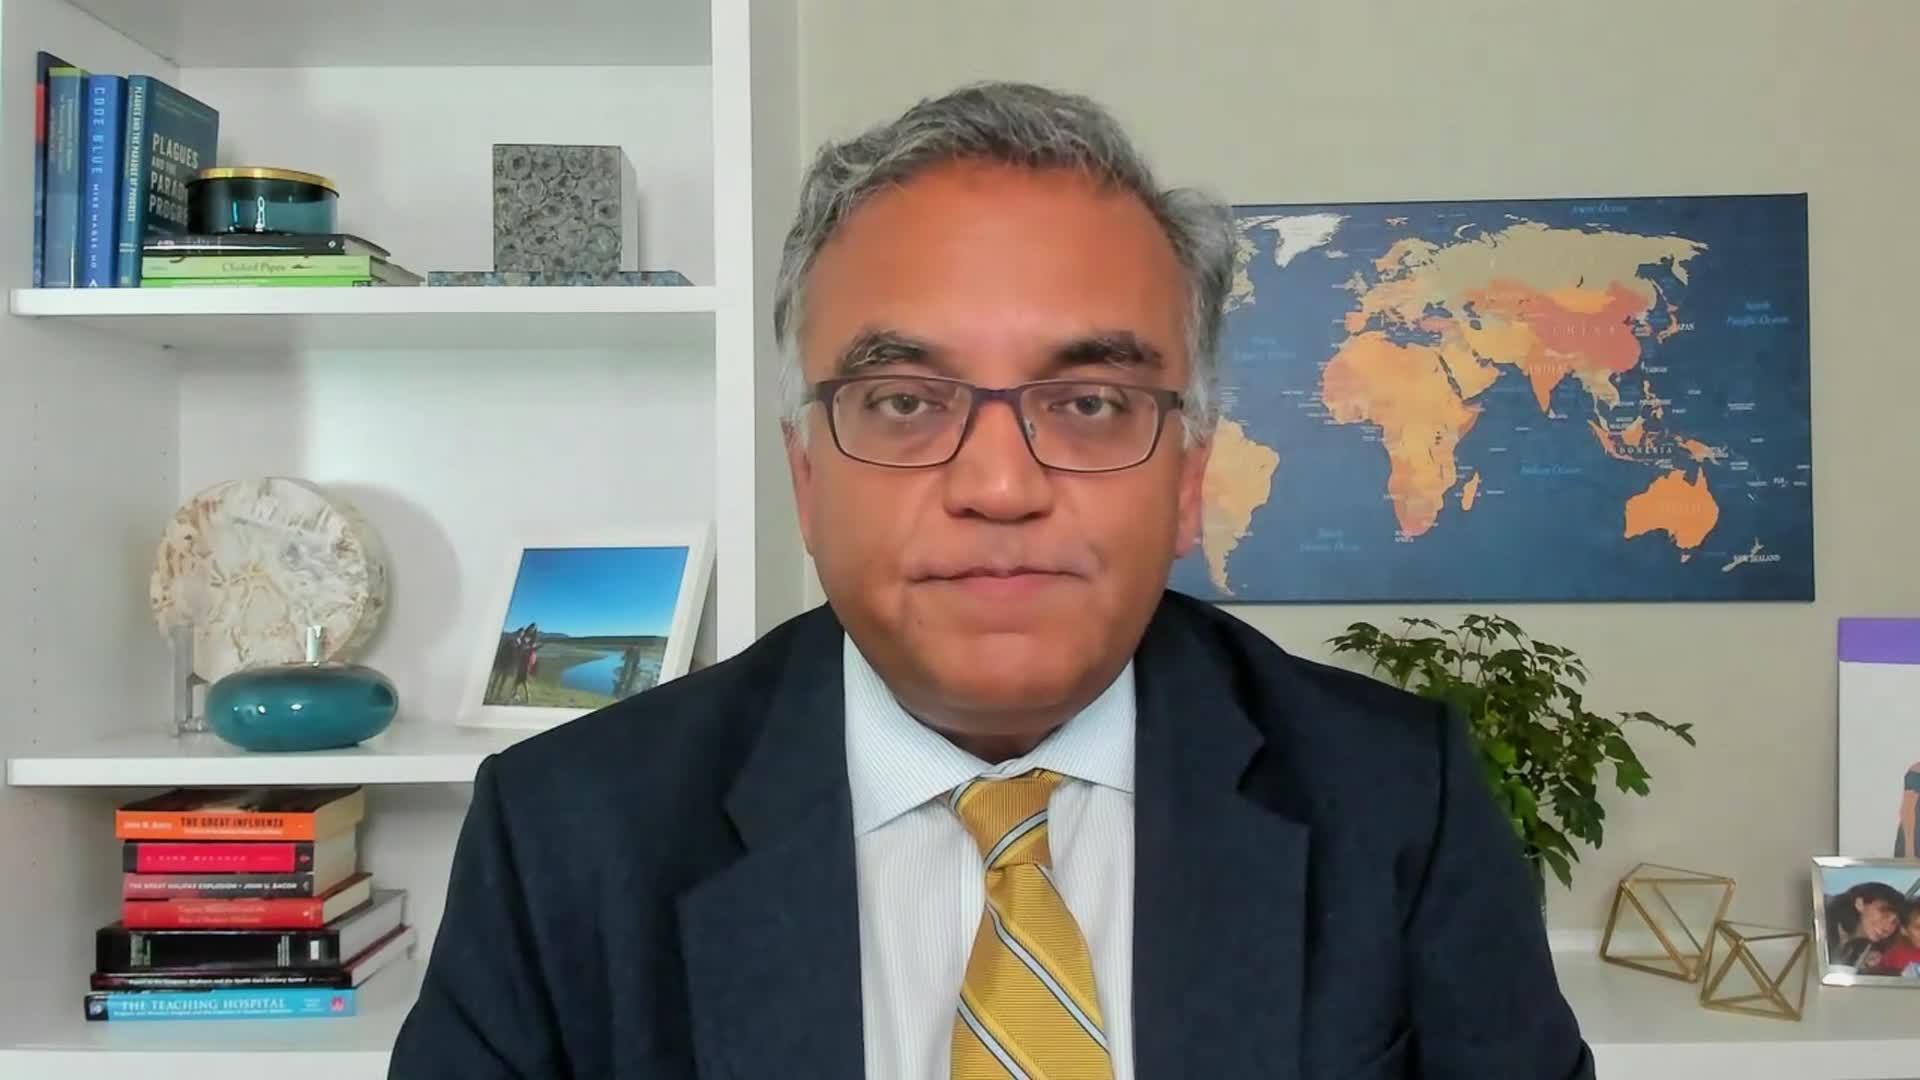 Dr. Ashish Jha, dean of the Brown University School of Public Health